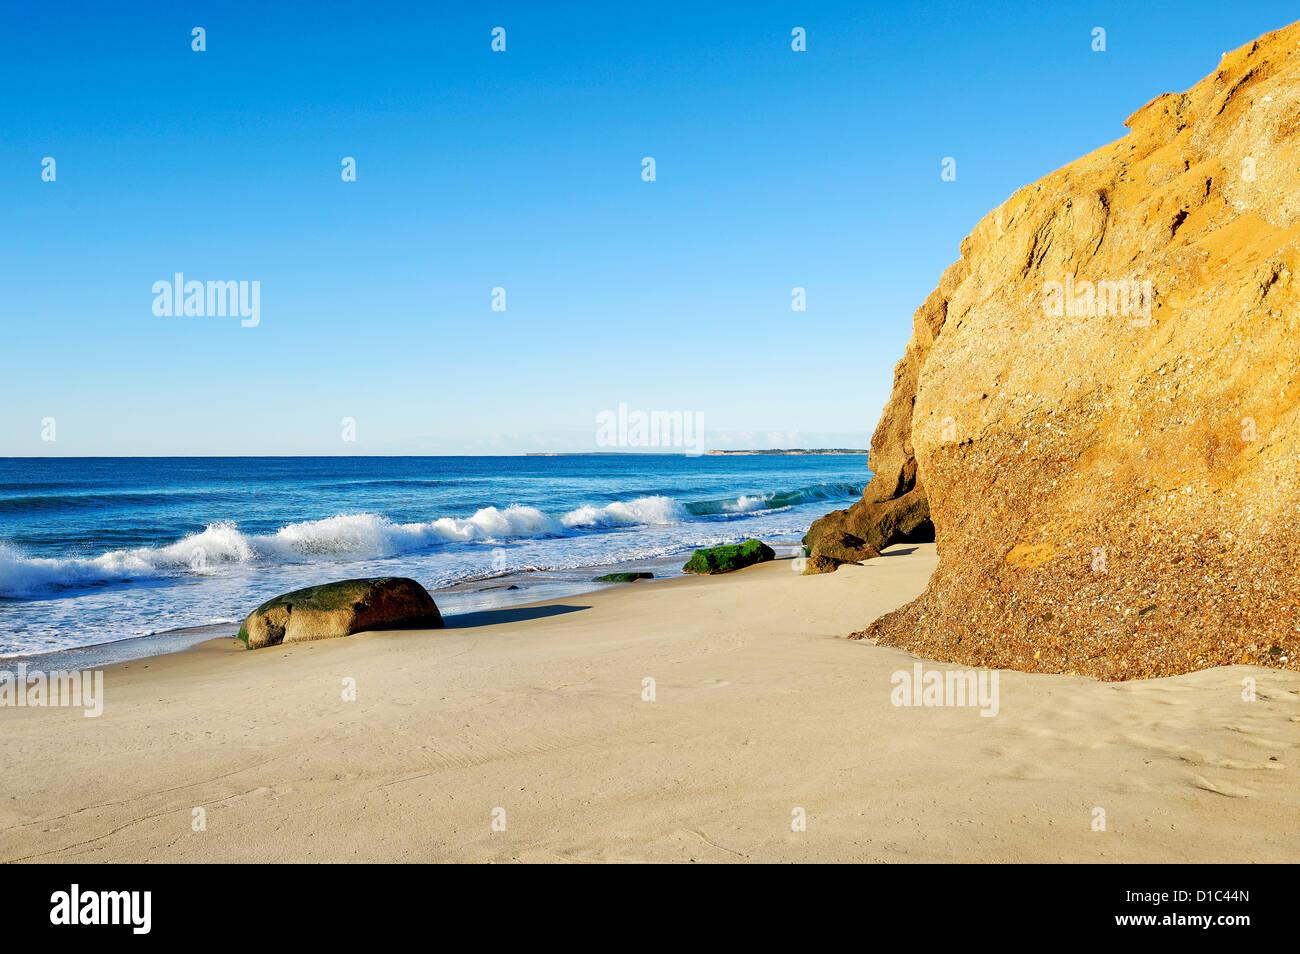 Lucy Vincent Beach, Chilmark, Martha's Vineyard, Massachusetts, USA - Stock Image